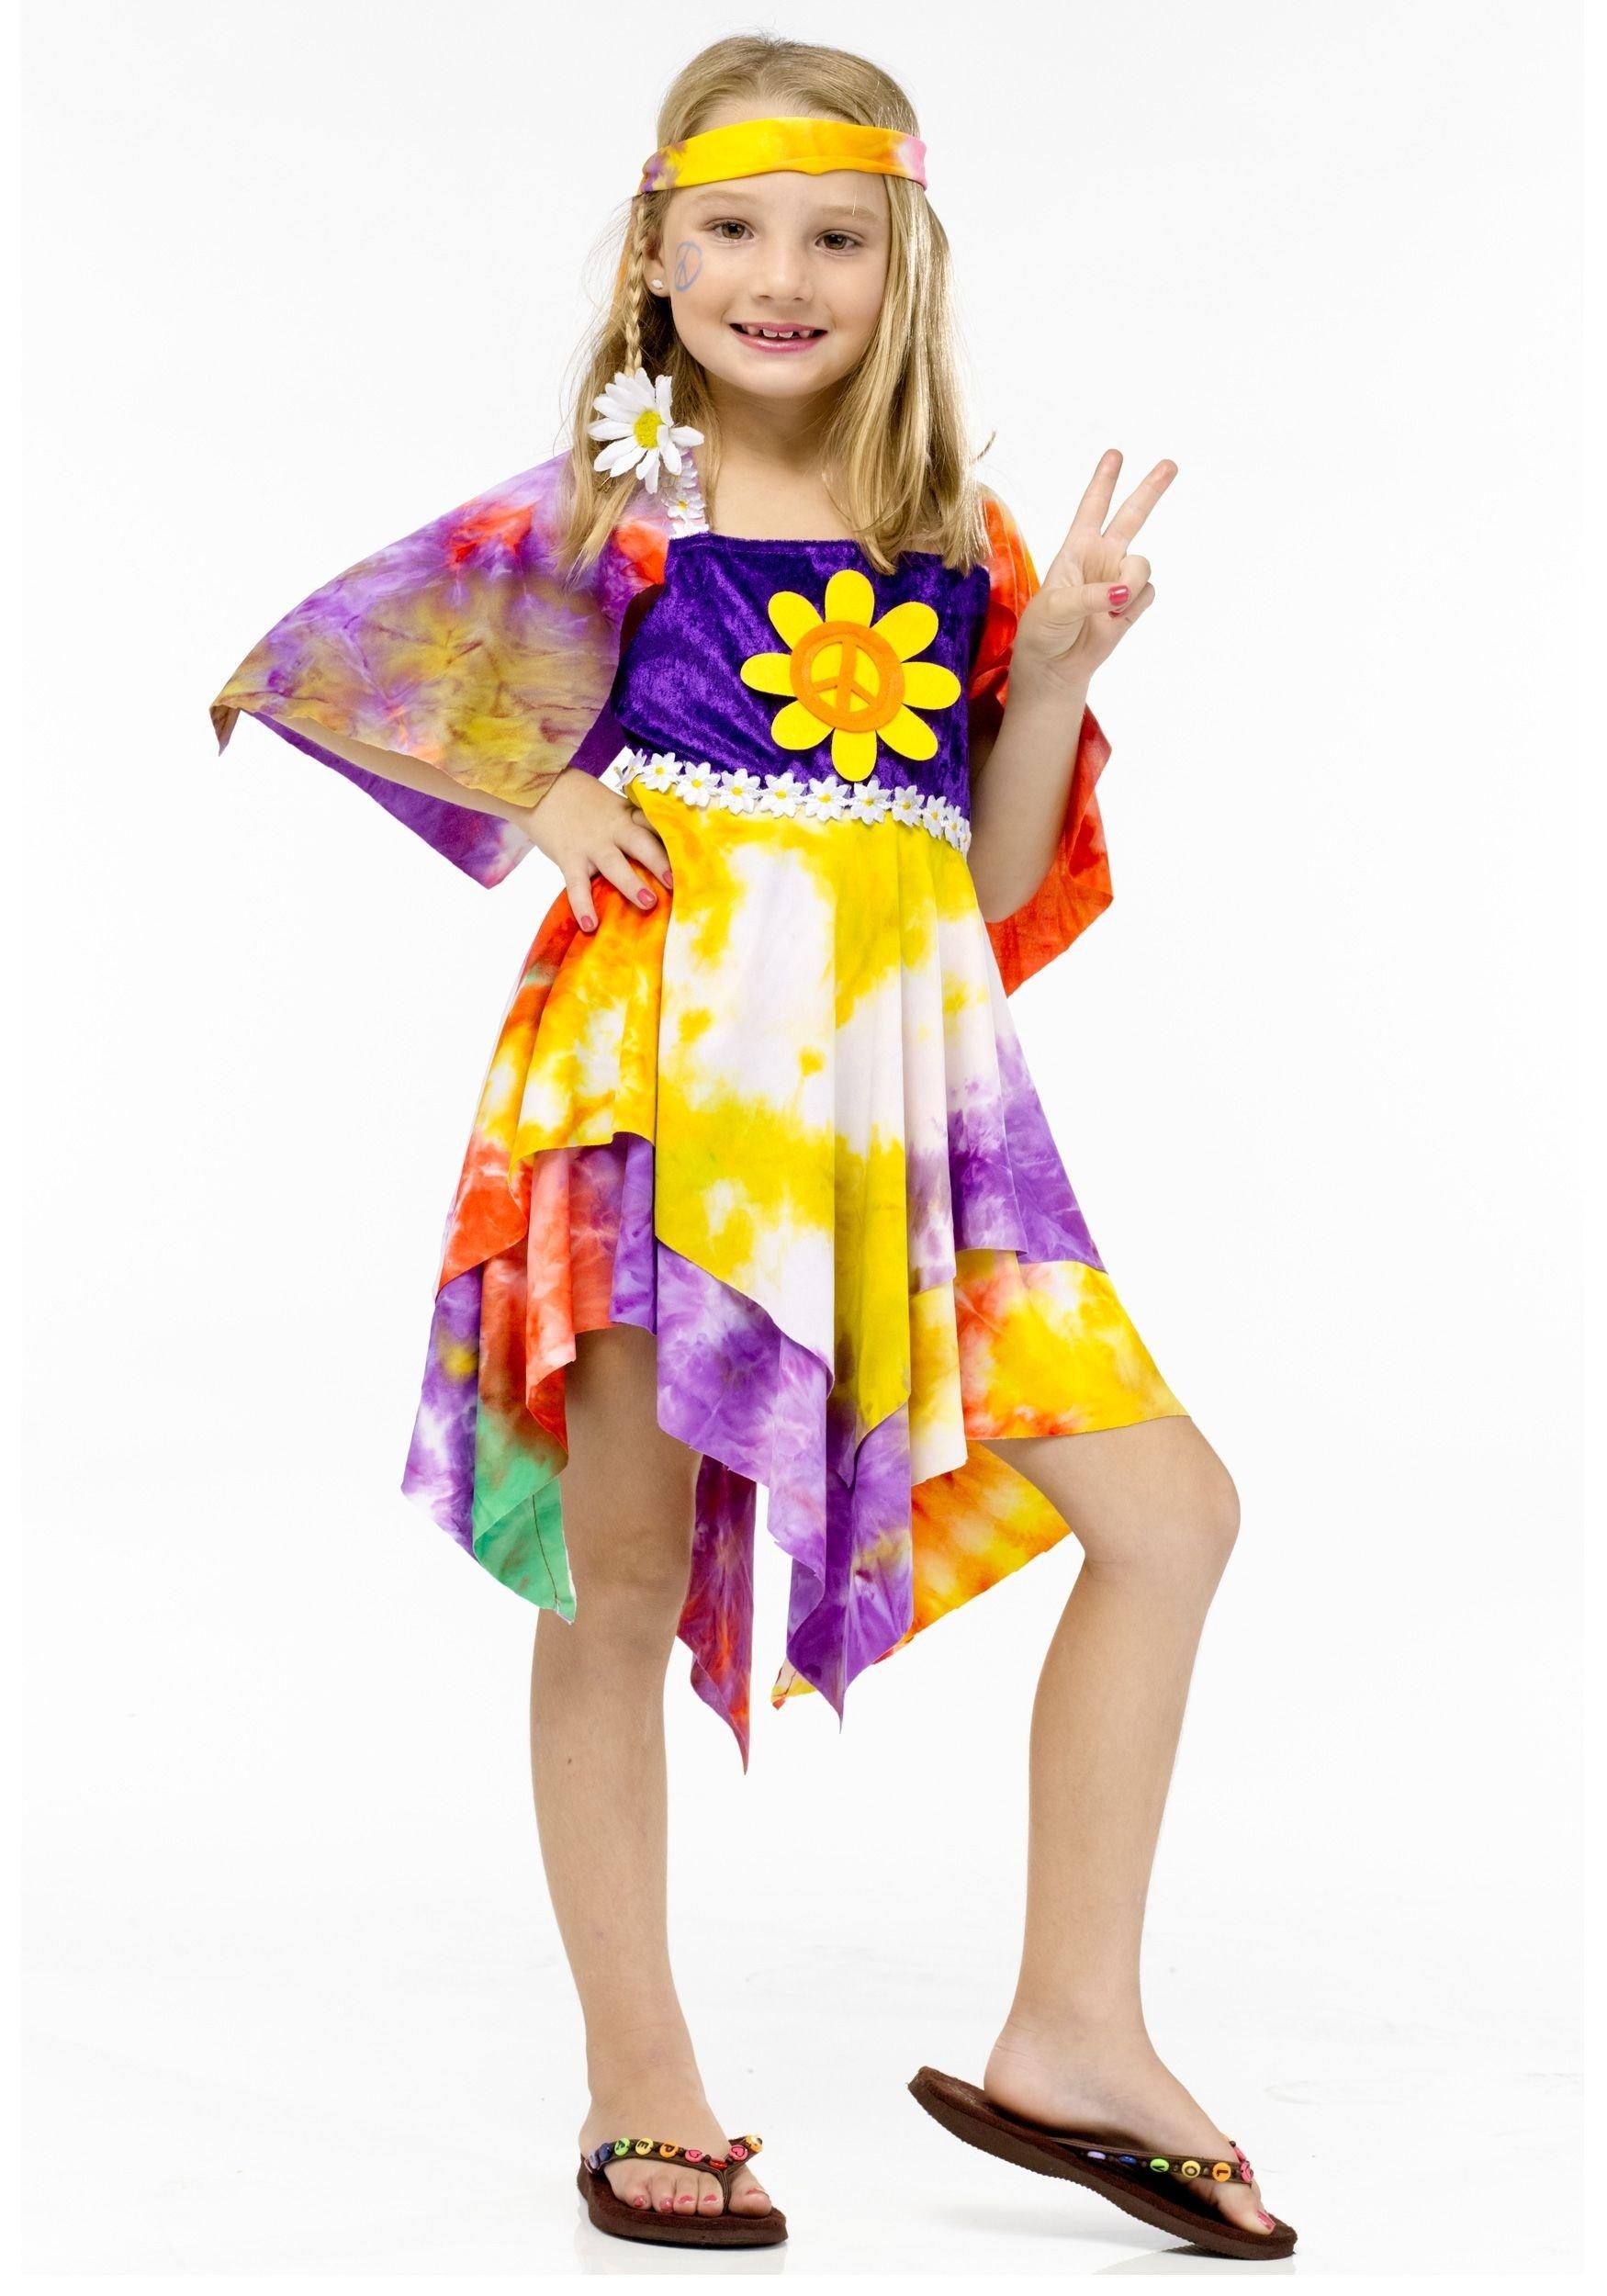 10 Great Kids Halloween Costume Ideas 2013 image detail for home halloween costume ideas vintage costumes 1 2020